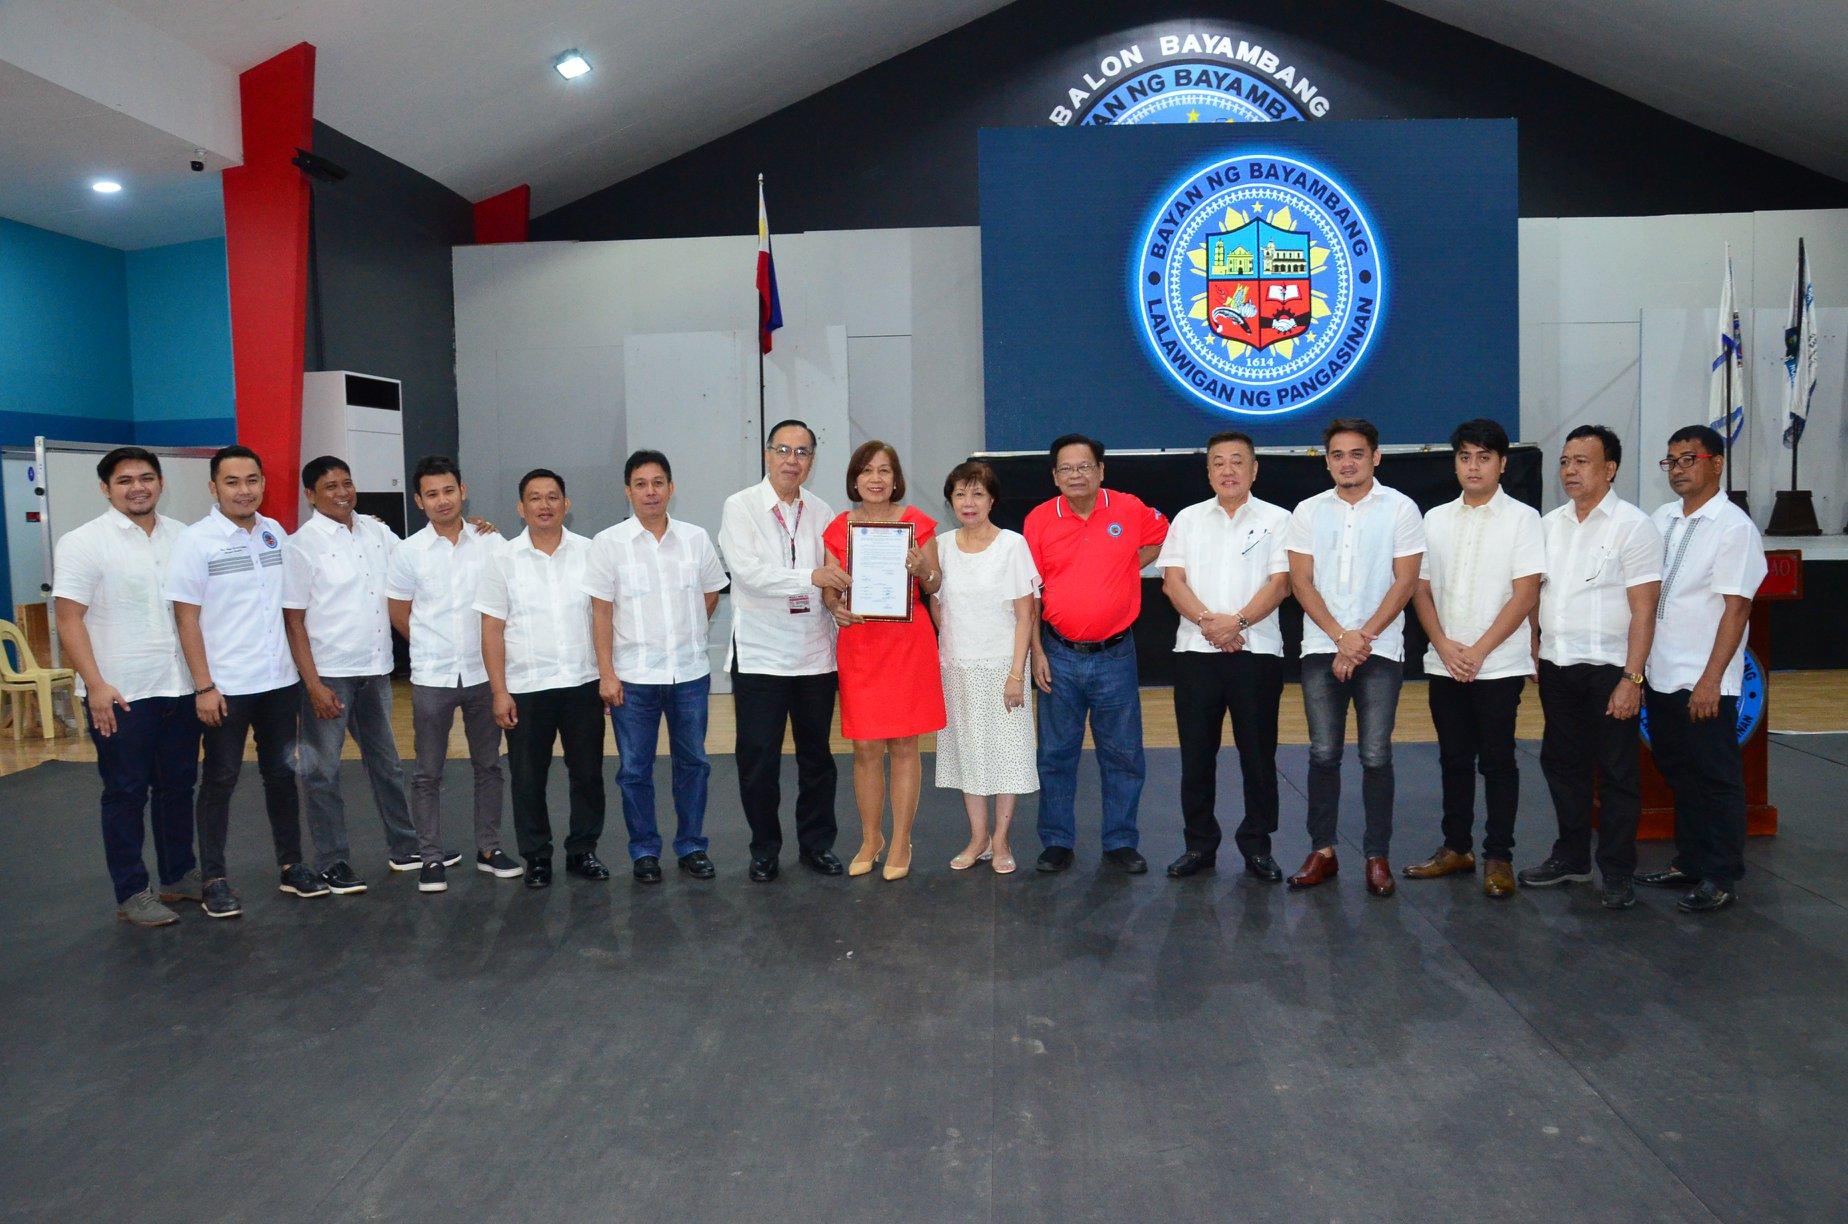 Monday Flag-Raising Ceremony, July 1, 2019